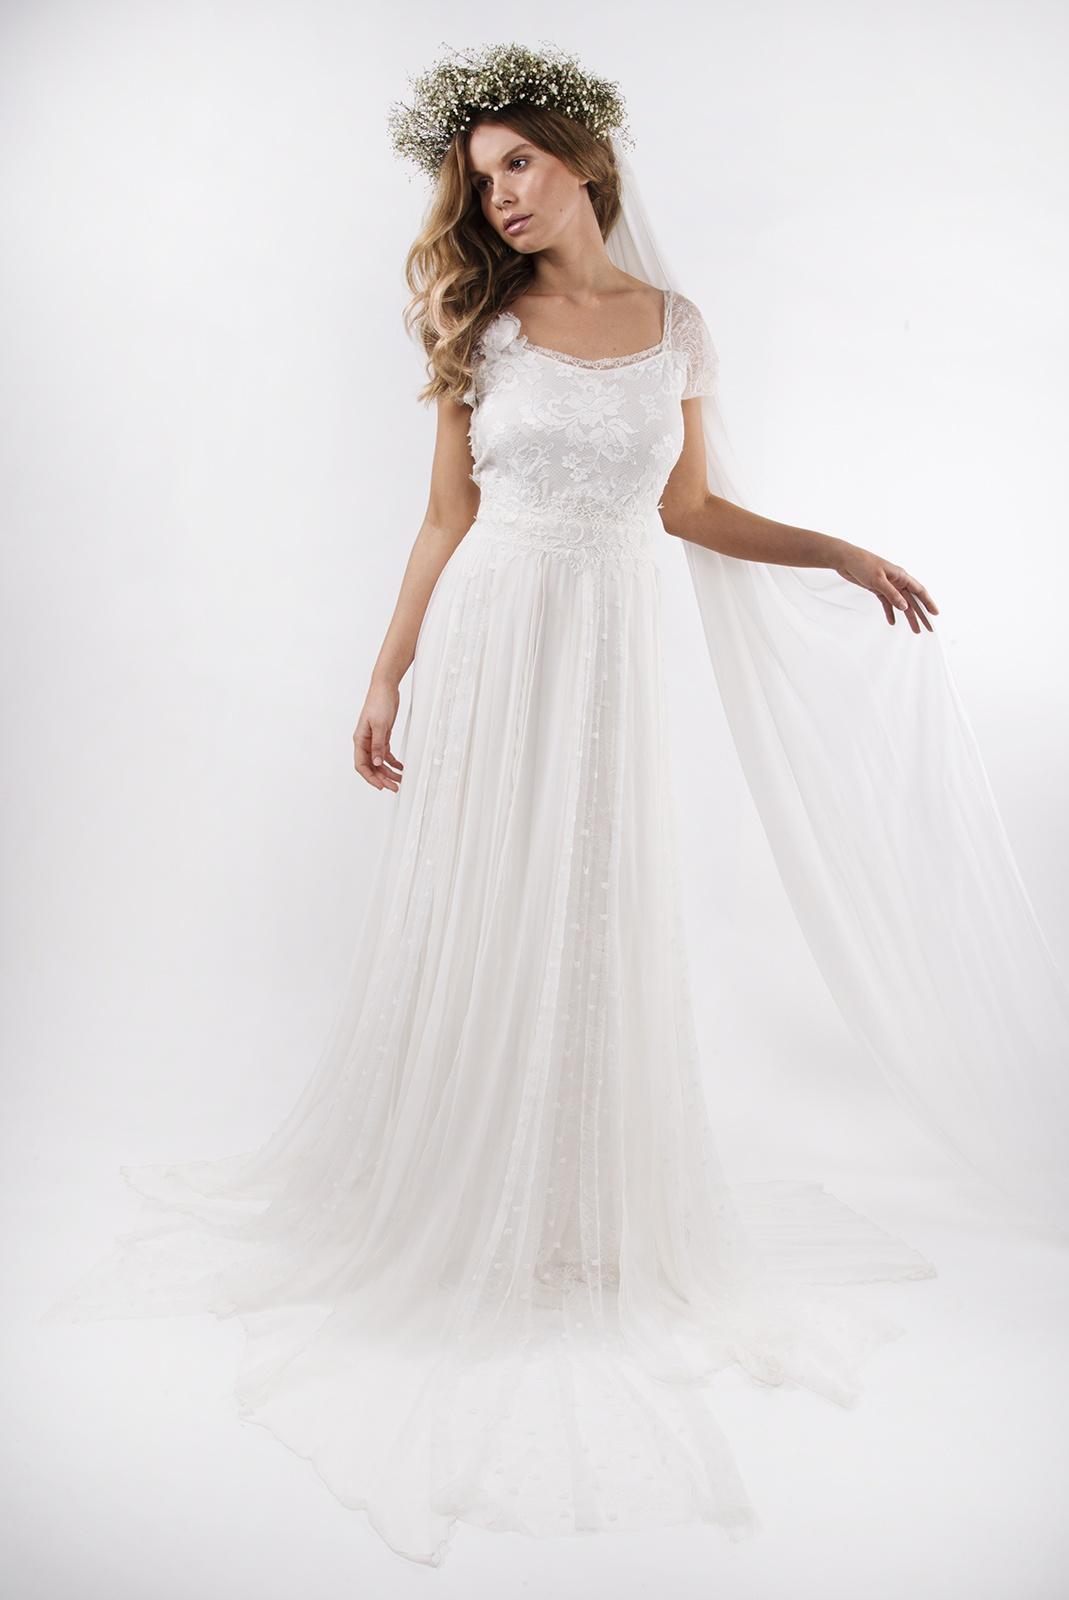 Winter Wedding Dresses On A Budget Gorgeous Dresses Under 1500